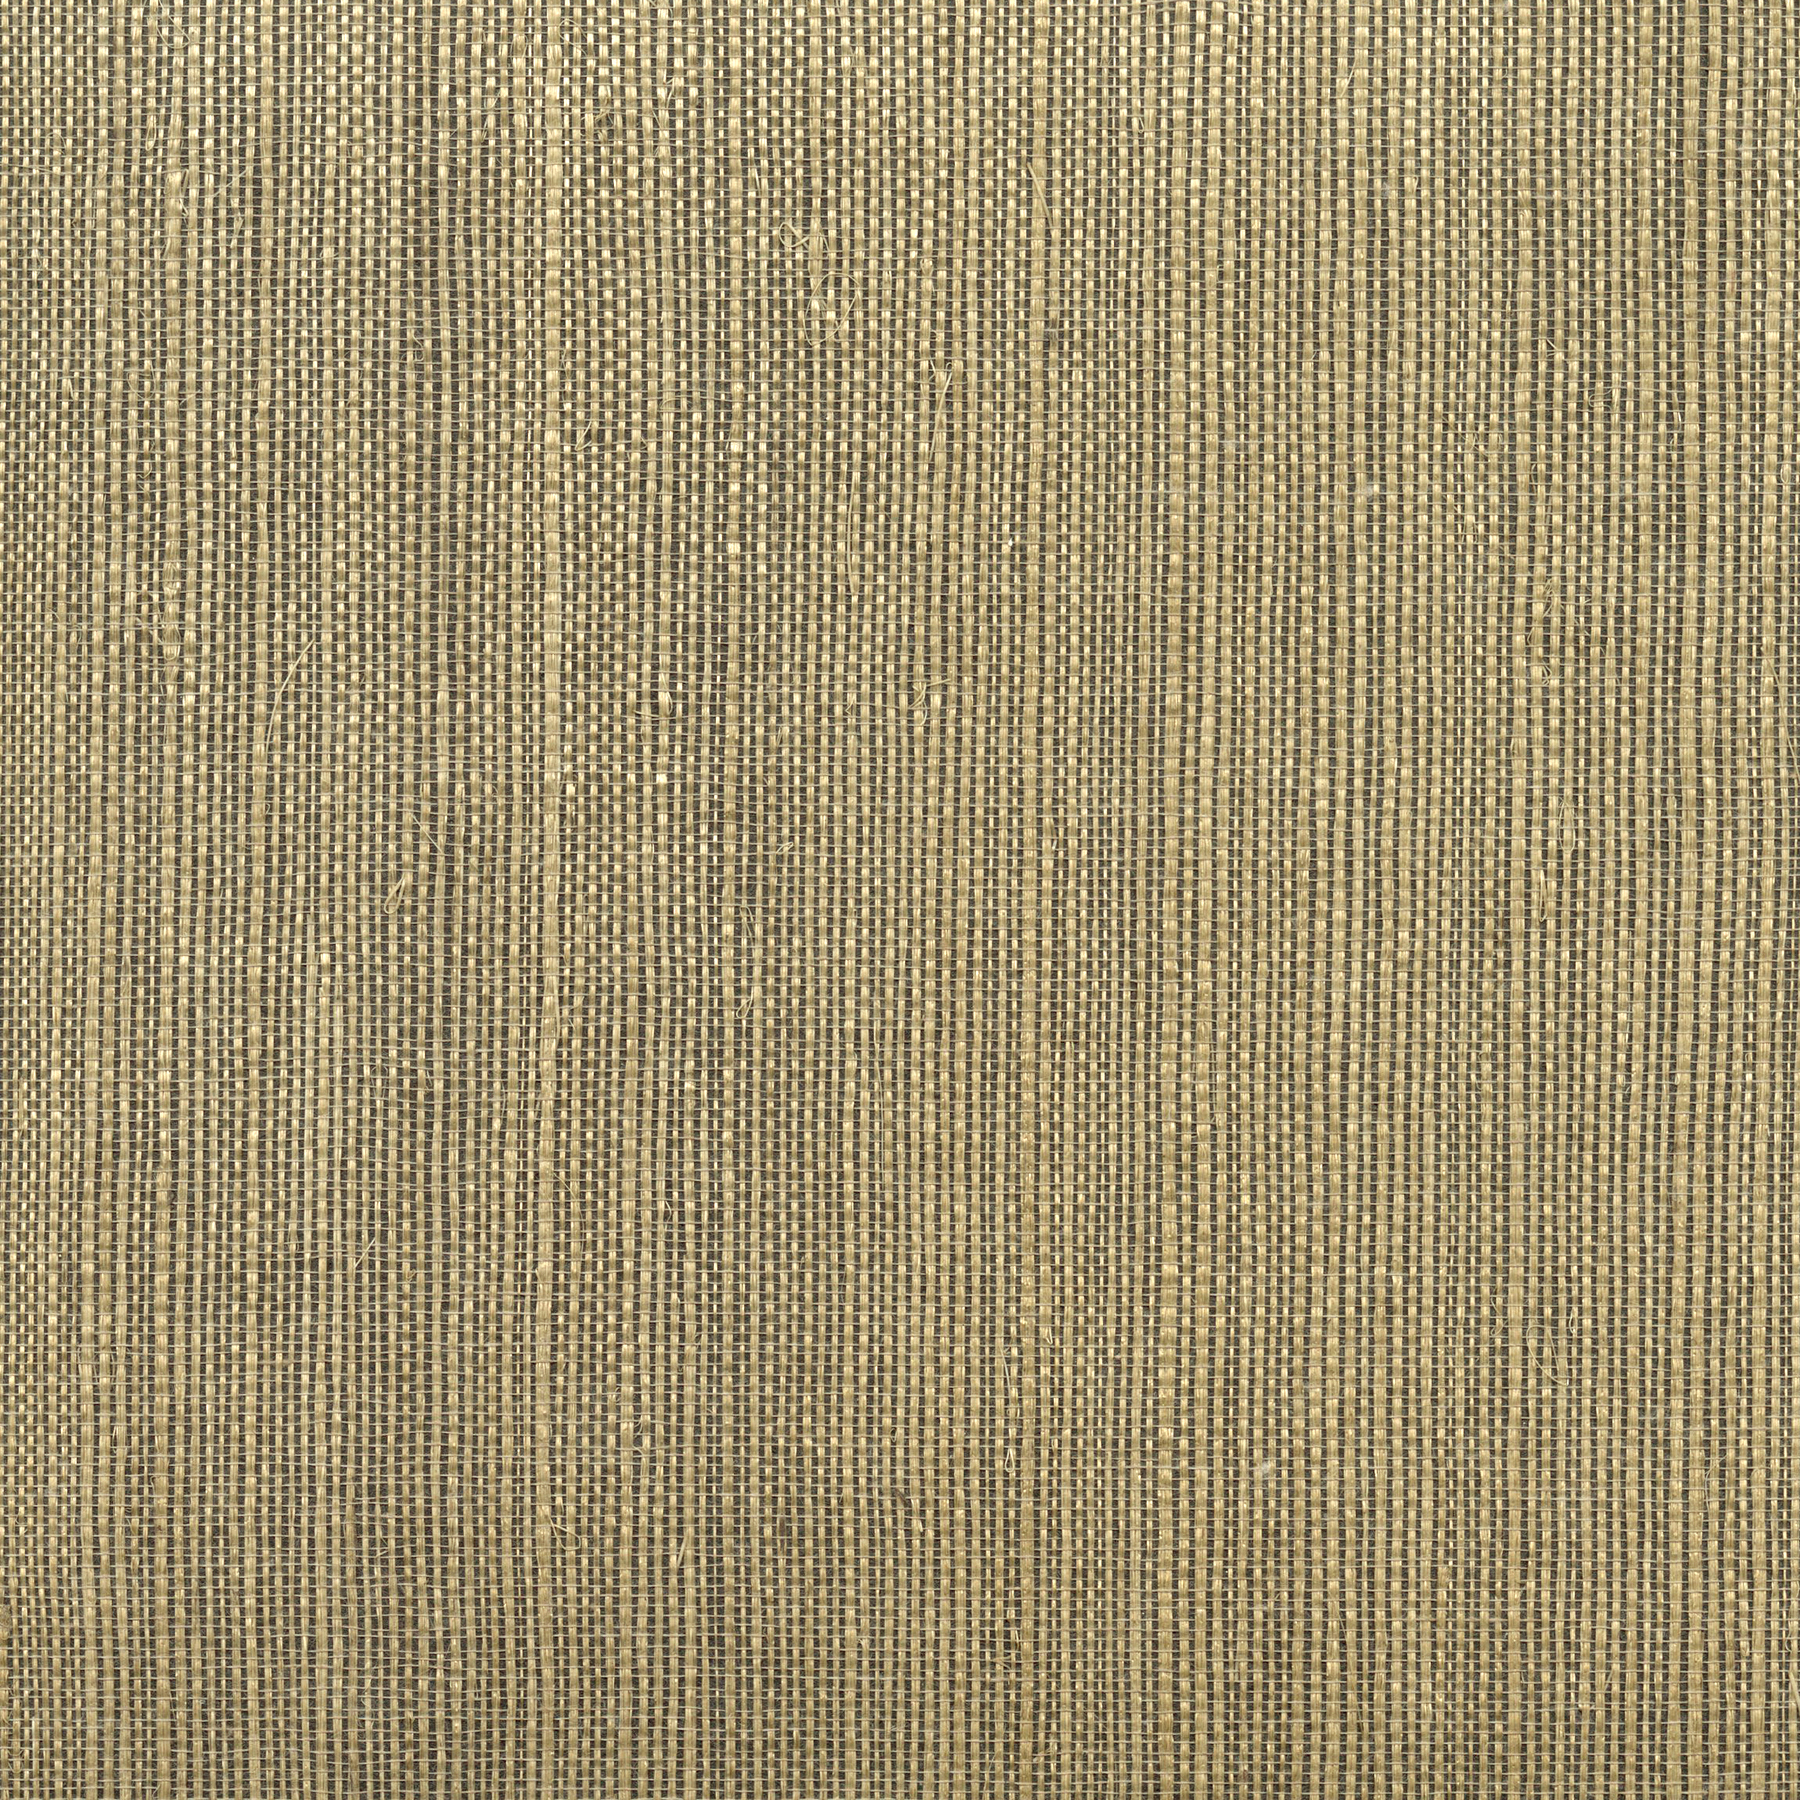 Picture of Barbora Chocolate Grasscloth Wallpaper